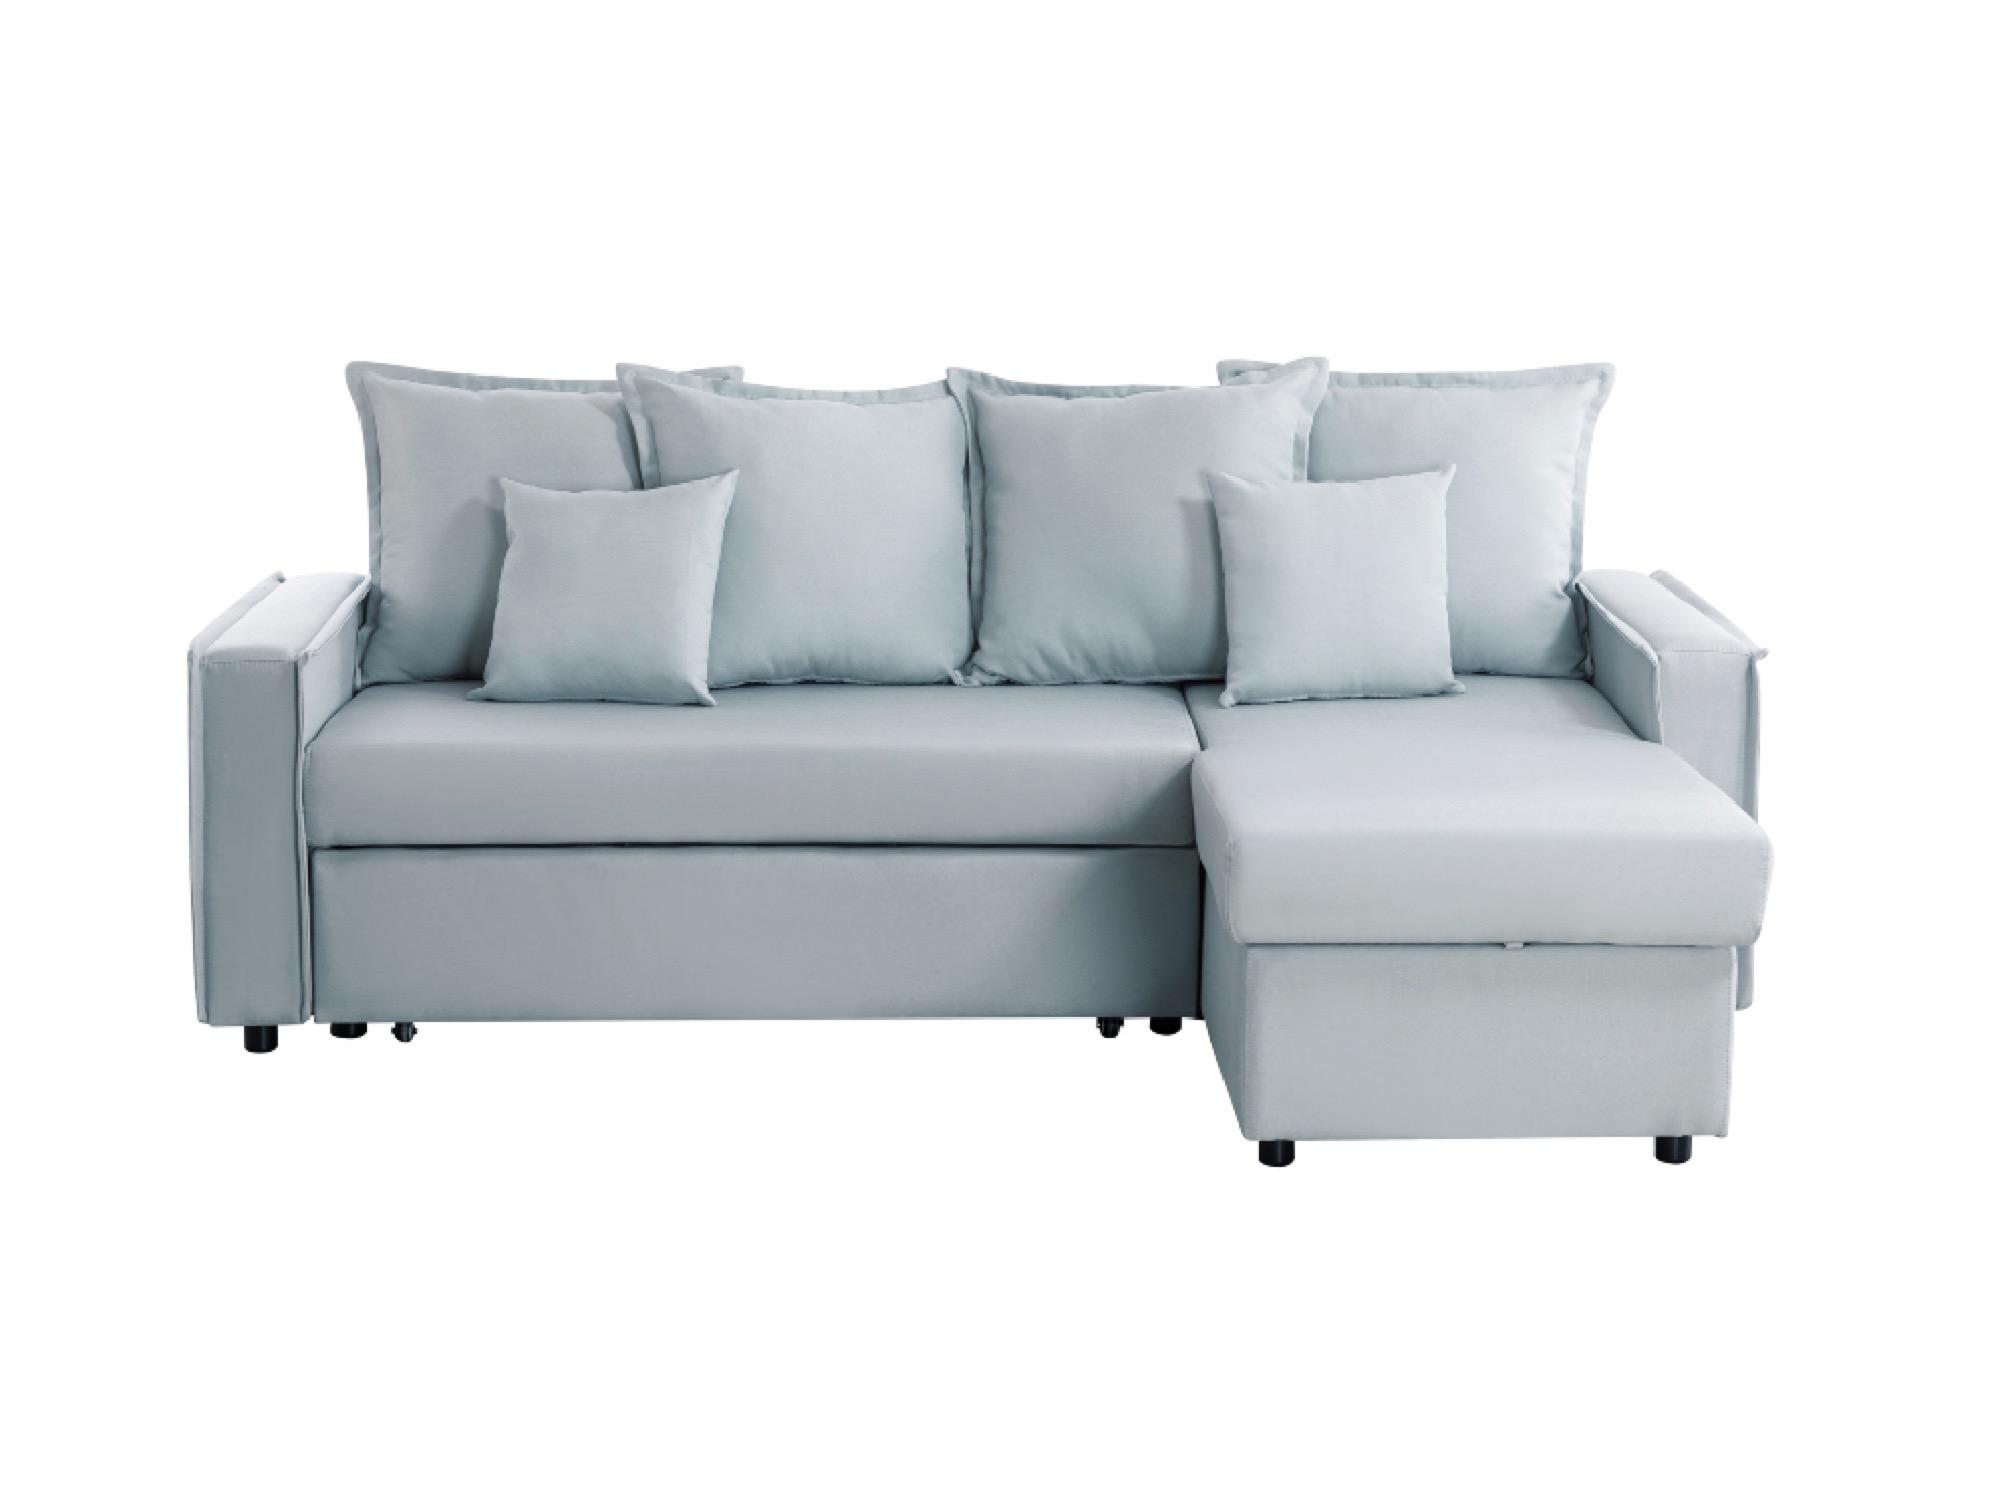 Canapé d'angle Bleu Tissu Moderne Confort